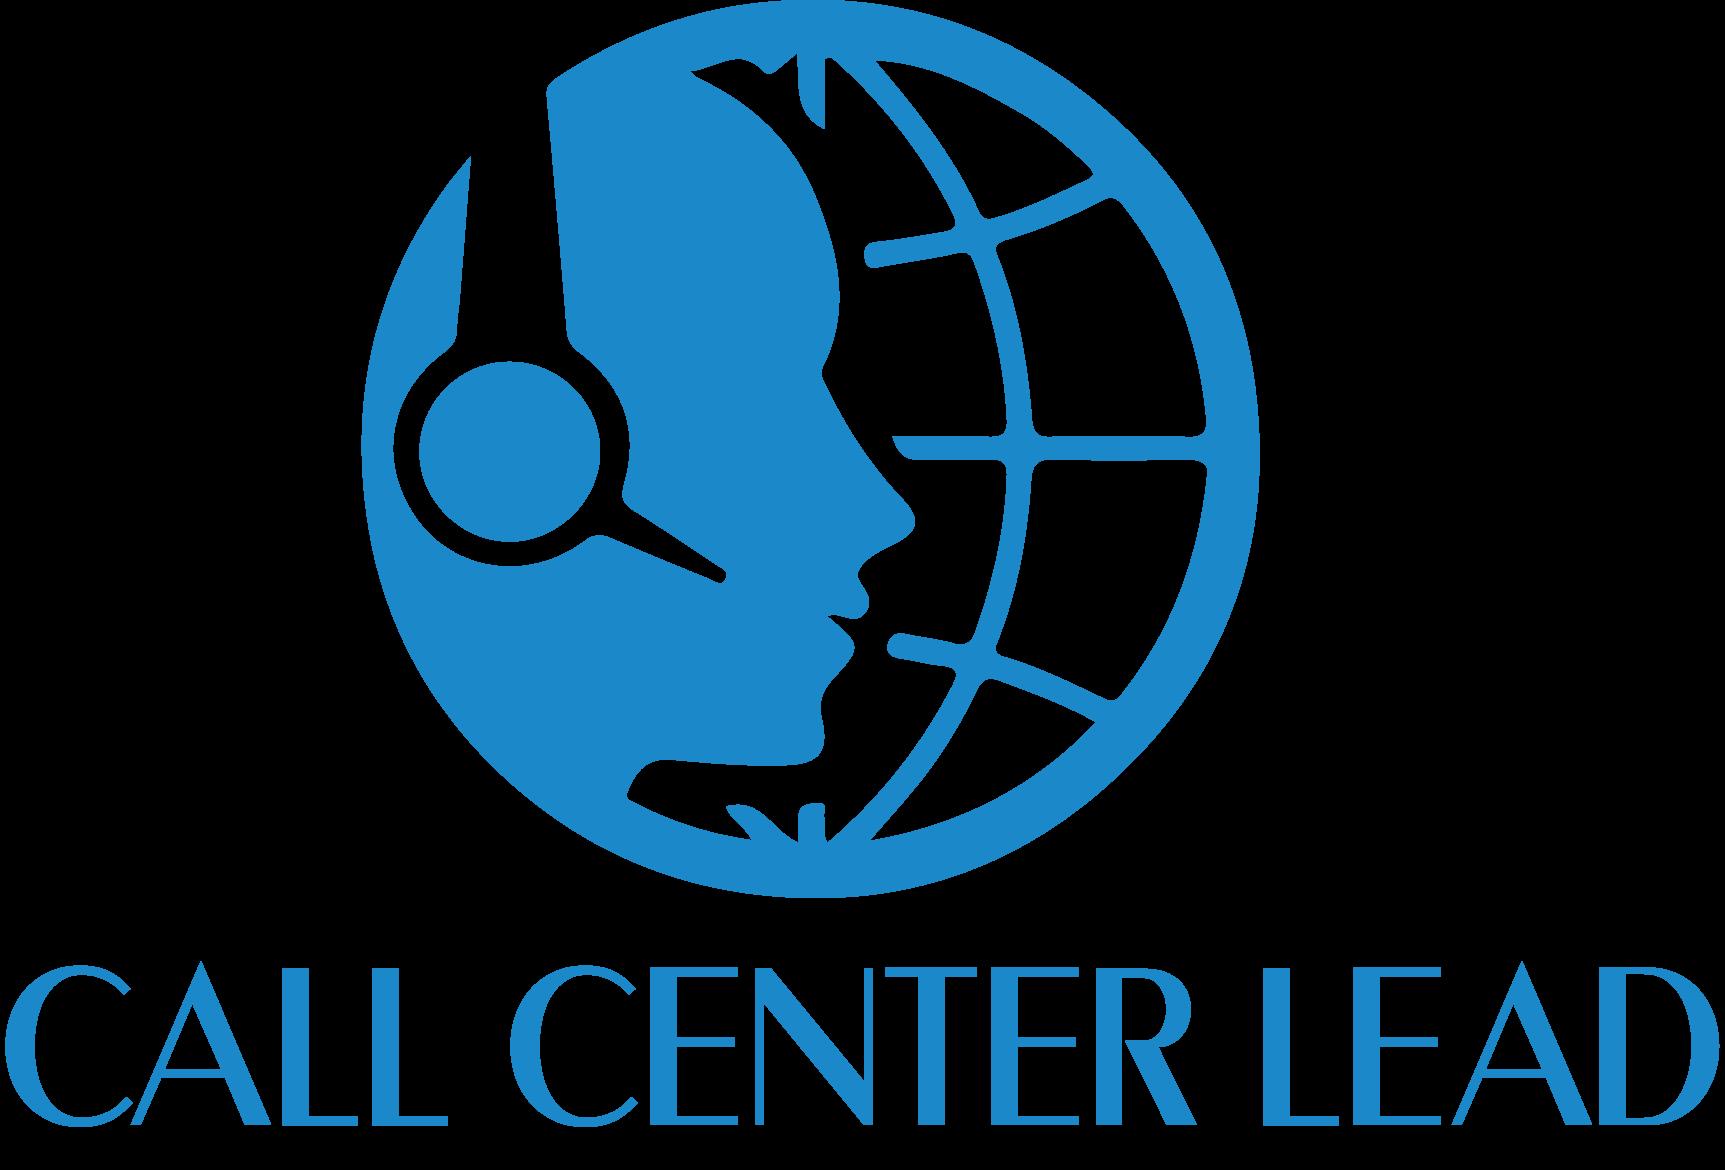 CALL CENTER LEAD